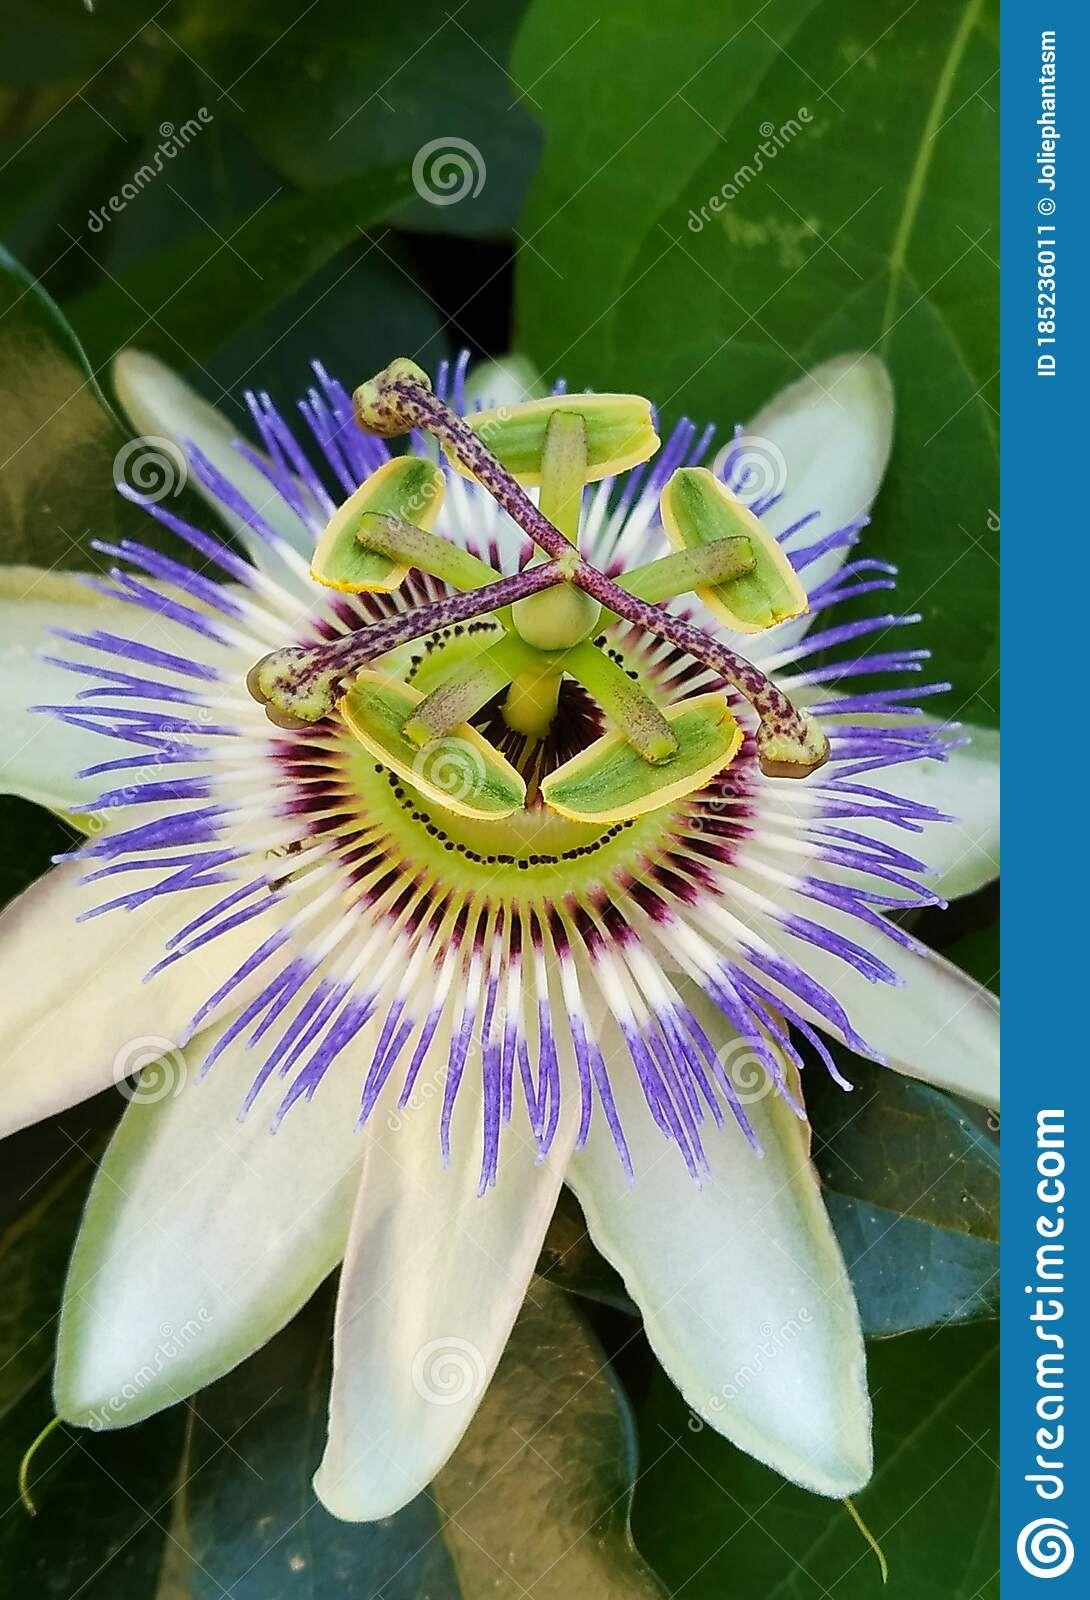 Pin By Lavinia Cucu On Flowers In 2020 Passiflora Caerulea Passiflora Flowers